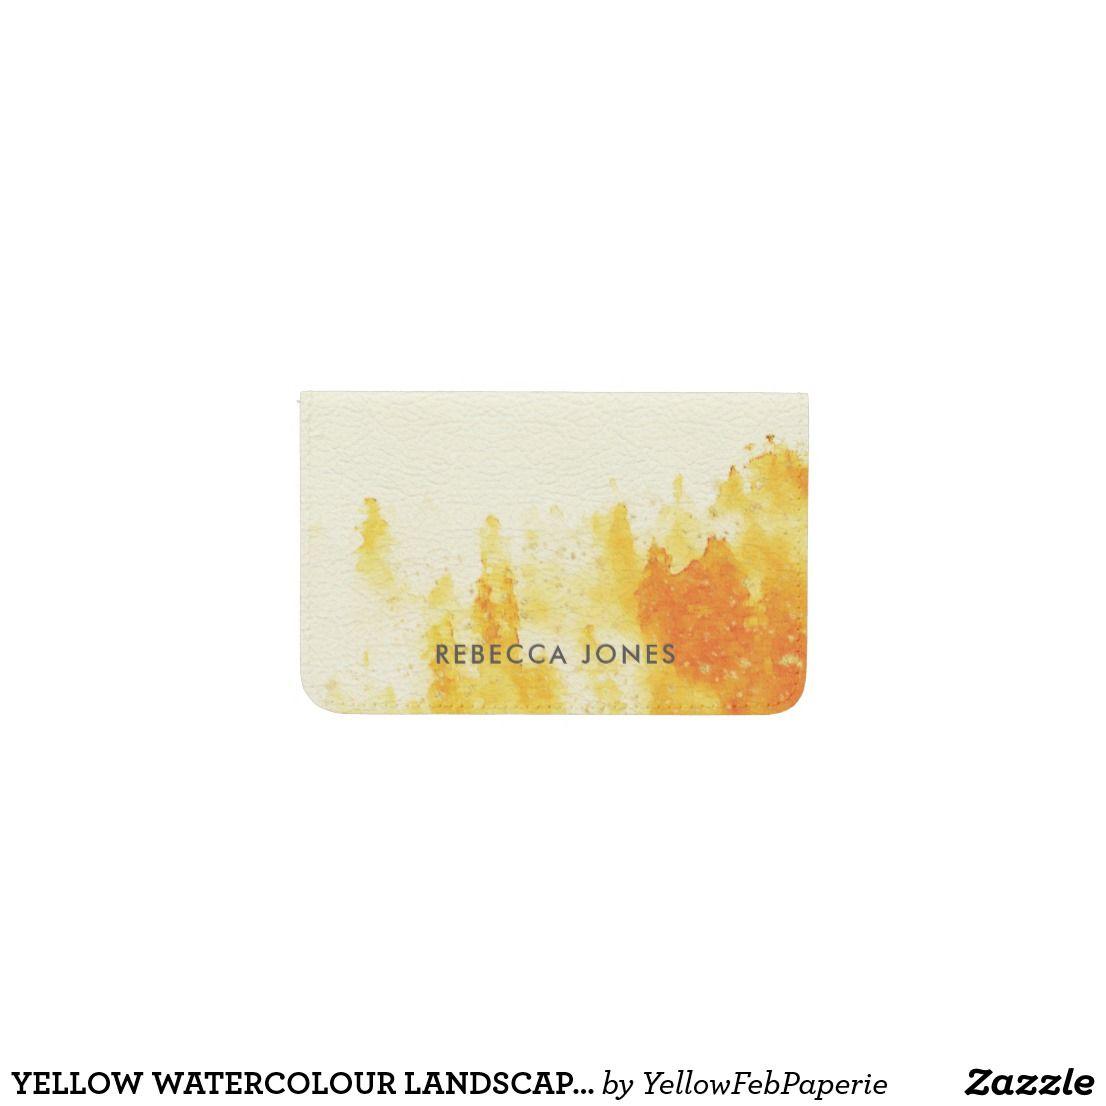 YELLOW WATERCOLOUR LANDSCAPE TREE FOLIAGE MONOGRAM BUSINESS CARD ...